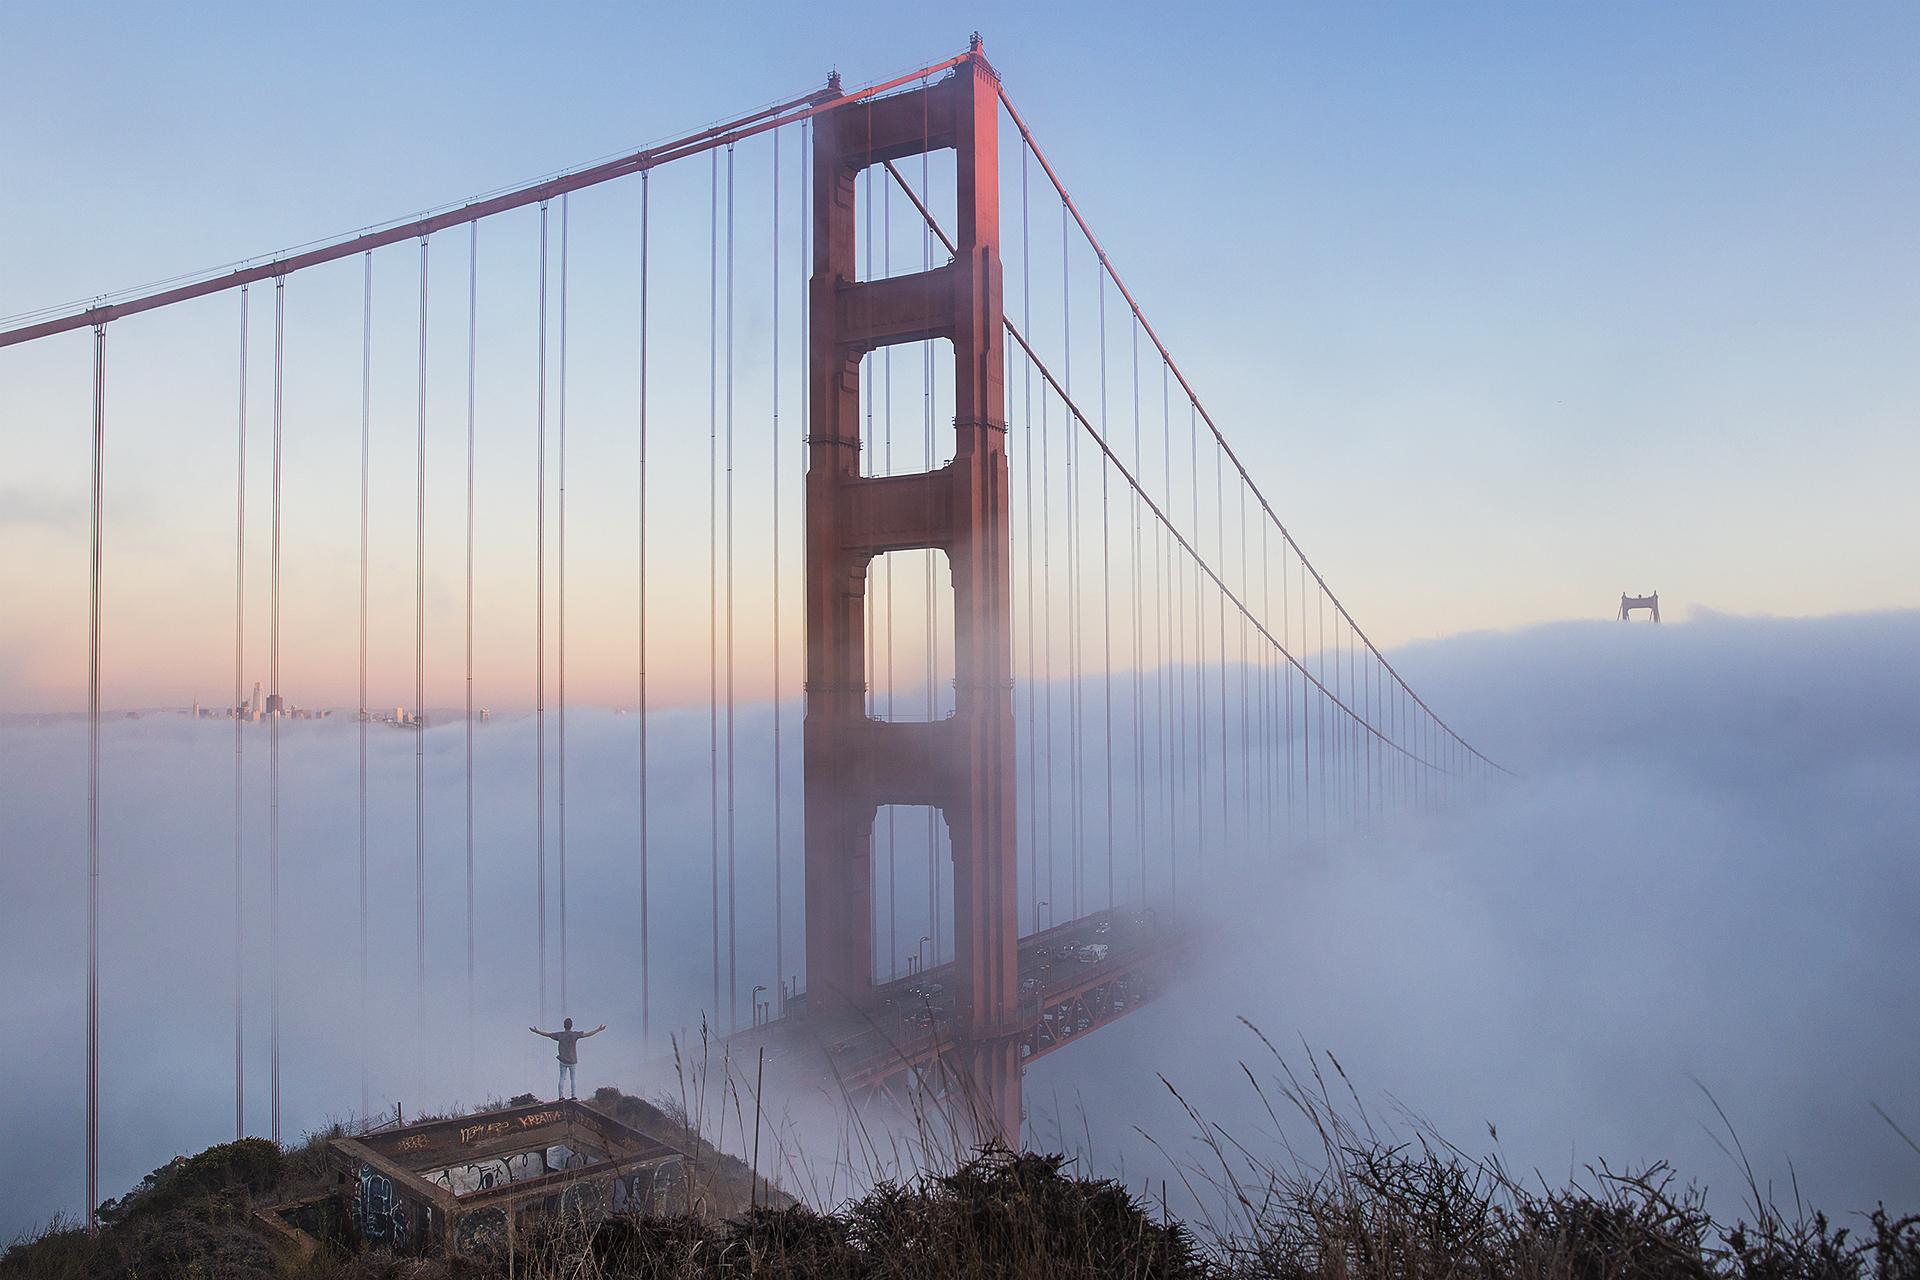 More Than Just Photos 653 - Golden Gate Bridge